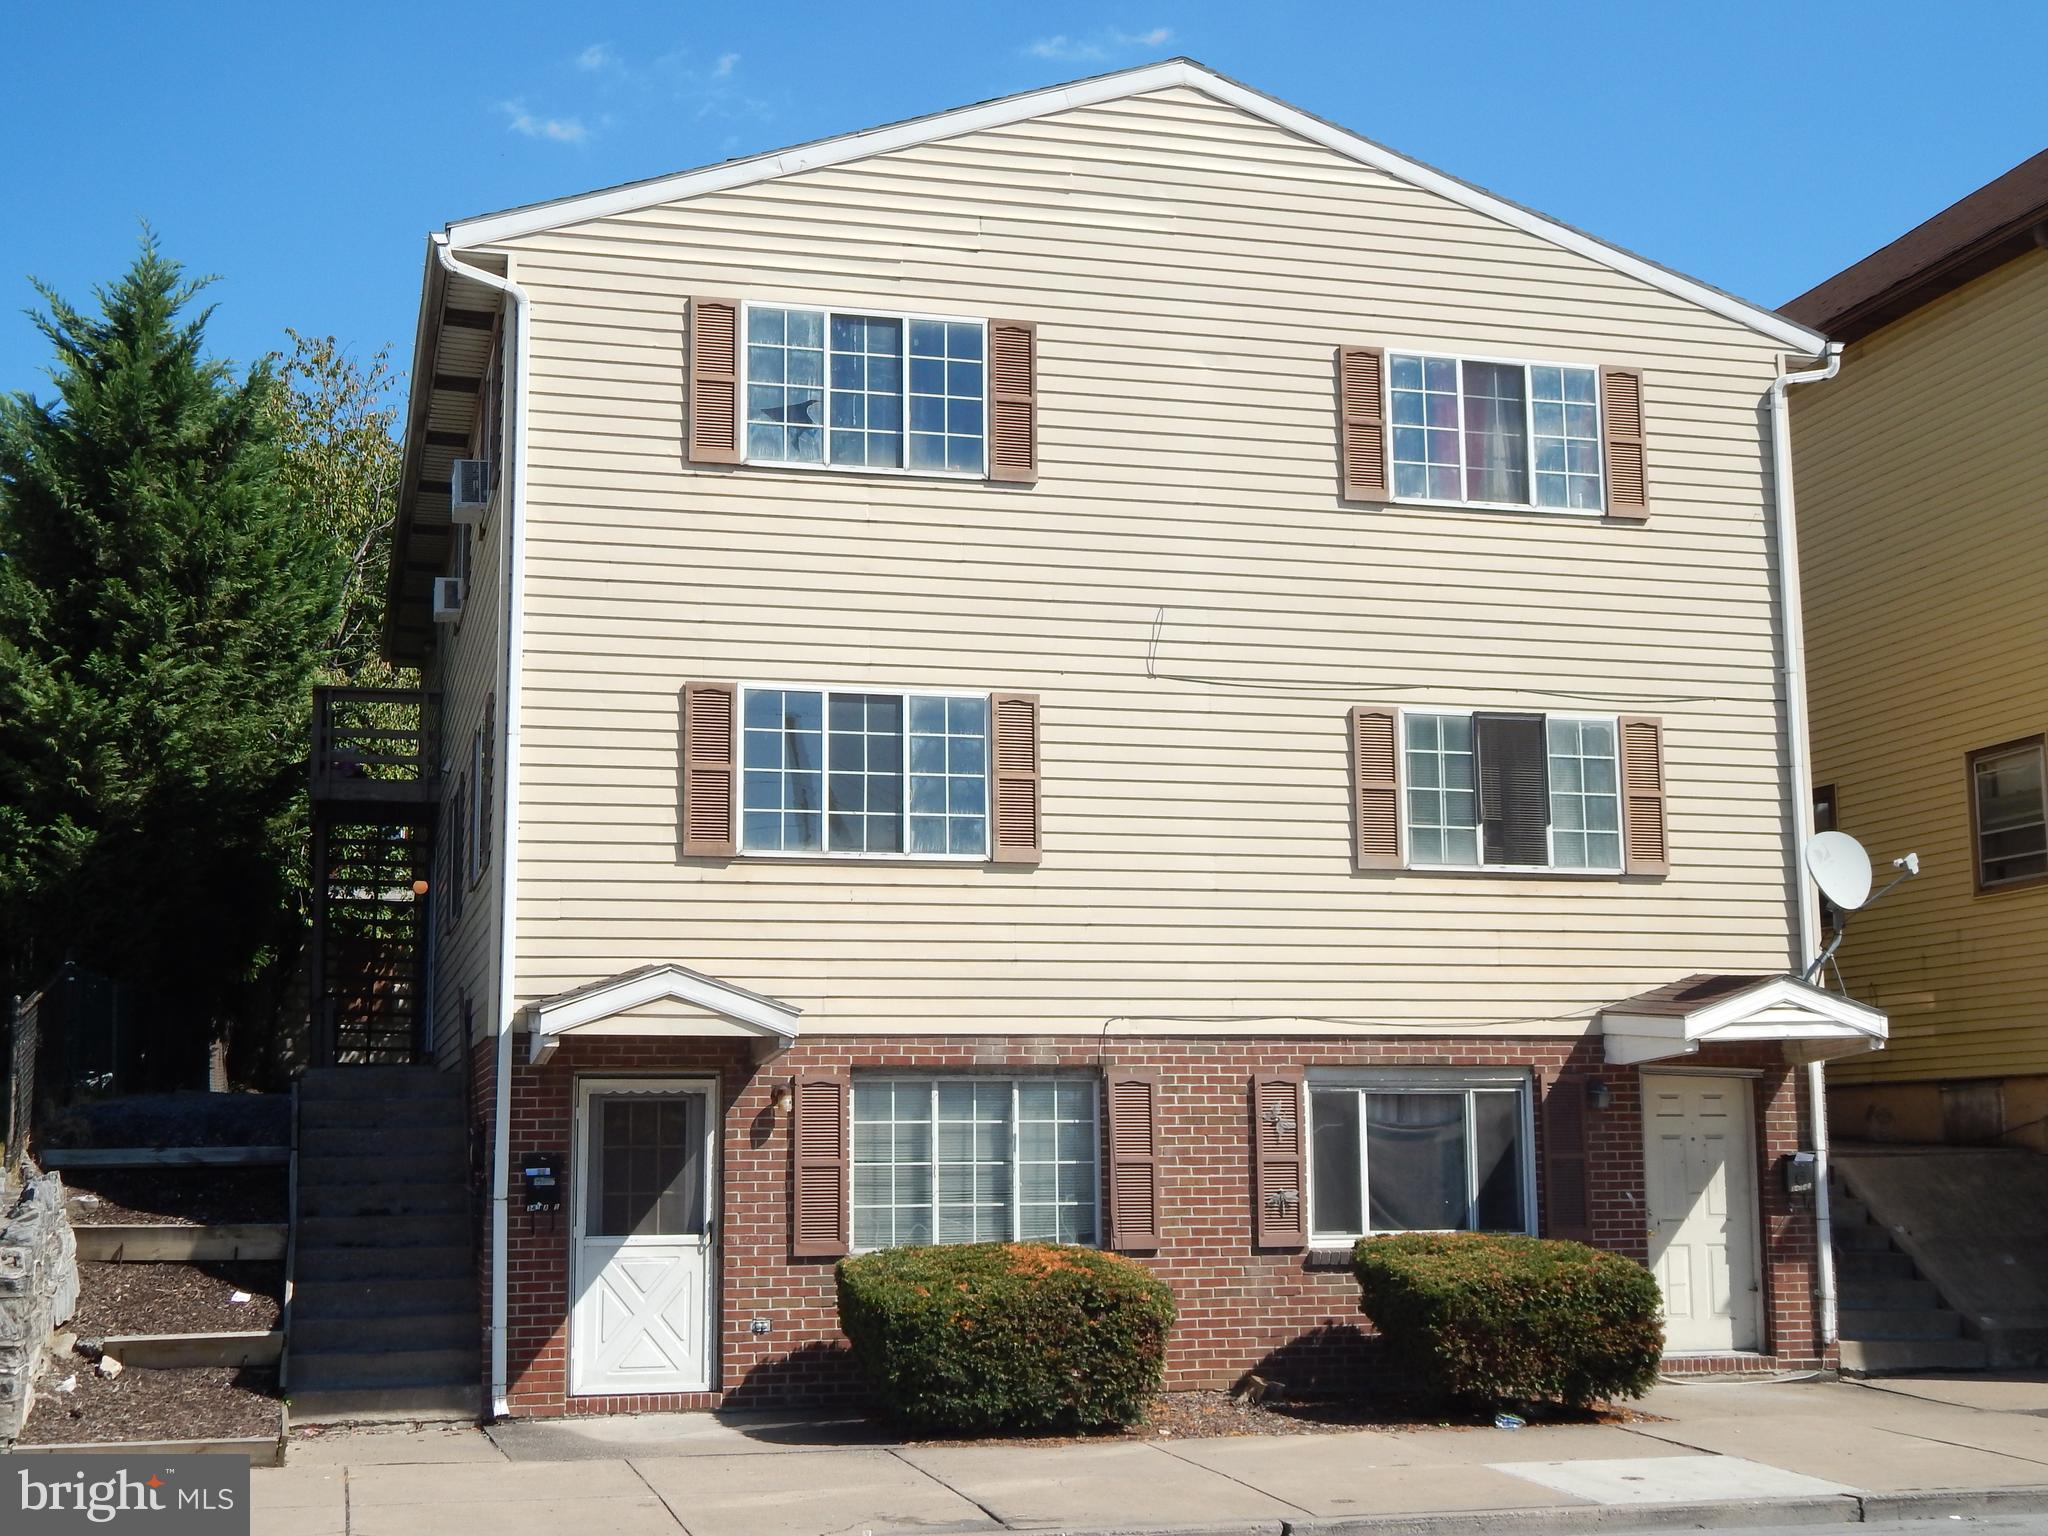 341 S FRONT STREET, STEELTON, PA 17113